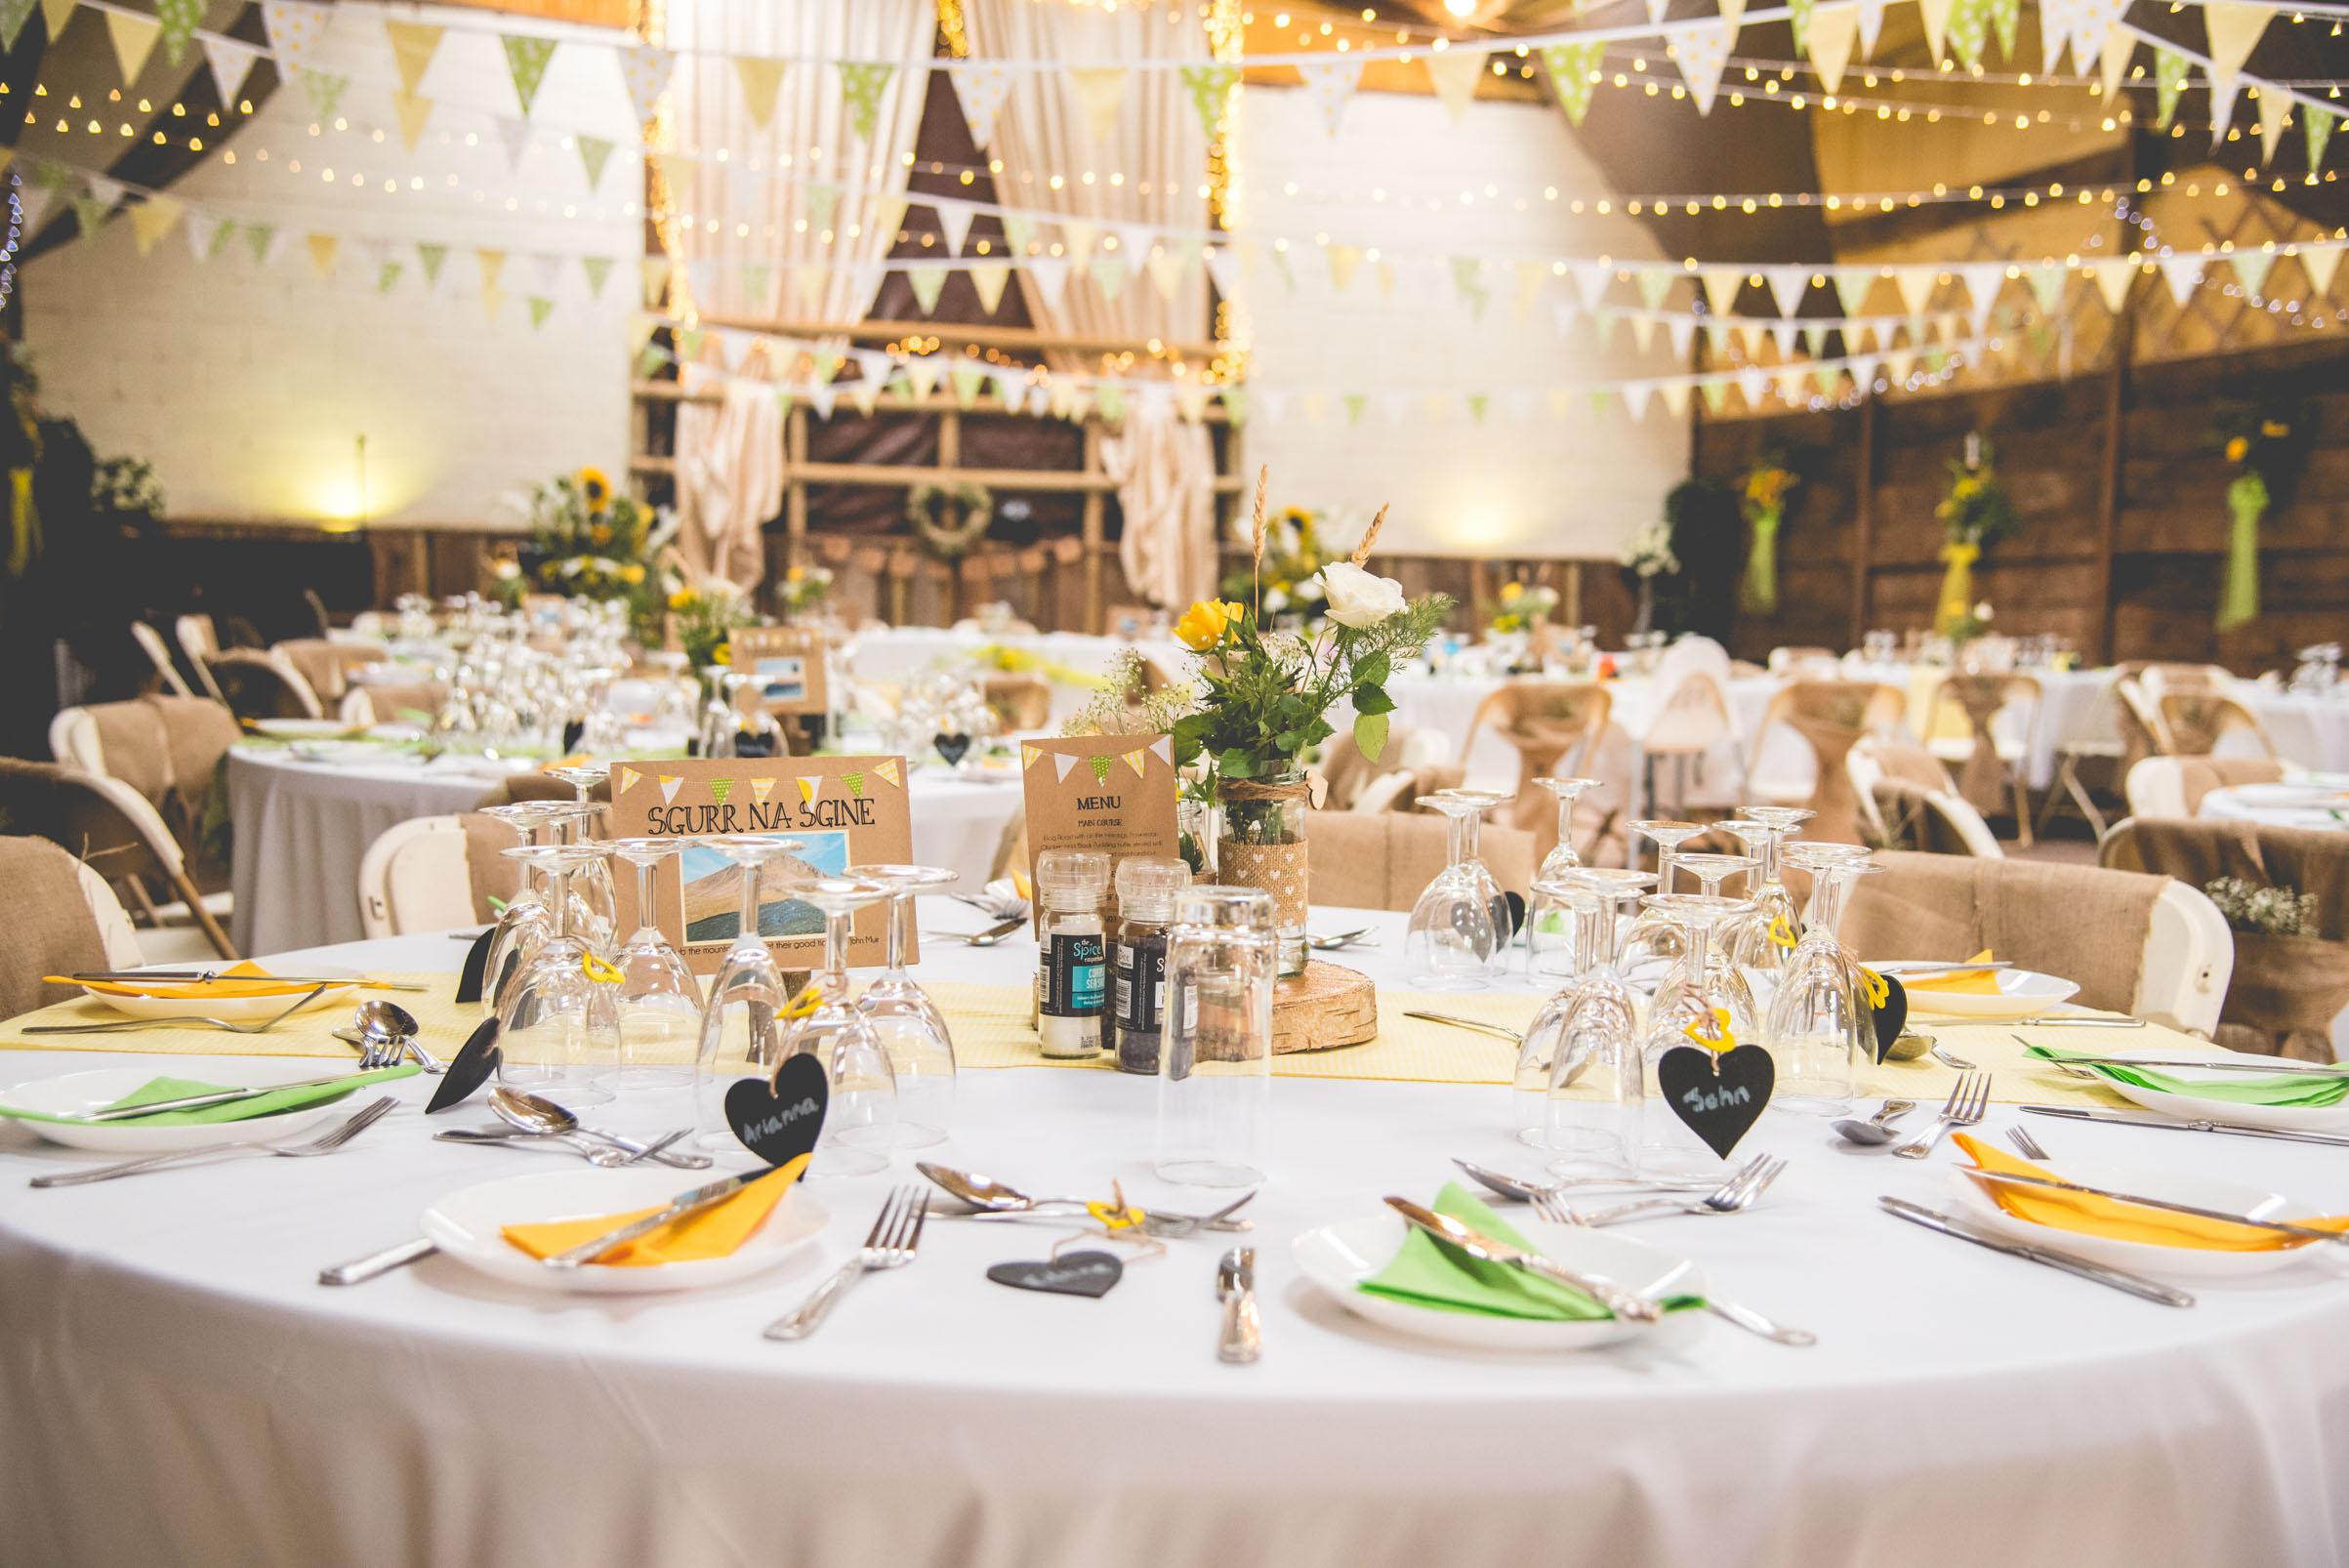 Peak+district+farm+wedding+lower+damgate+photographer-16.jpg